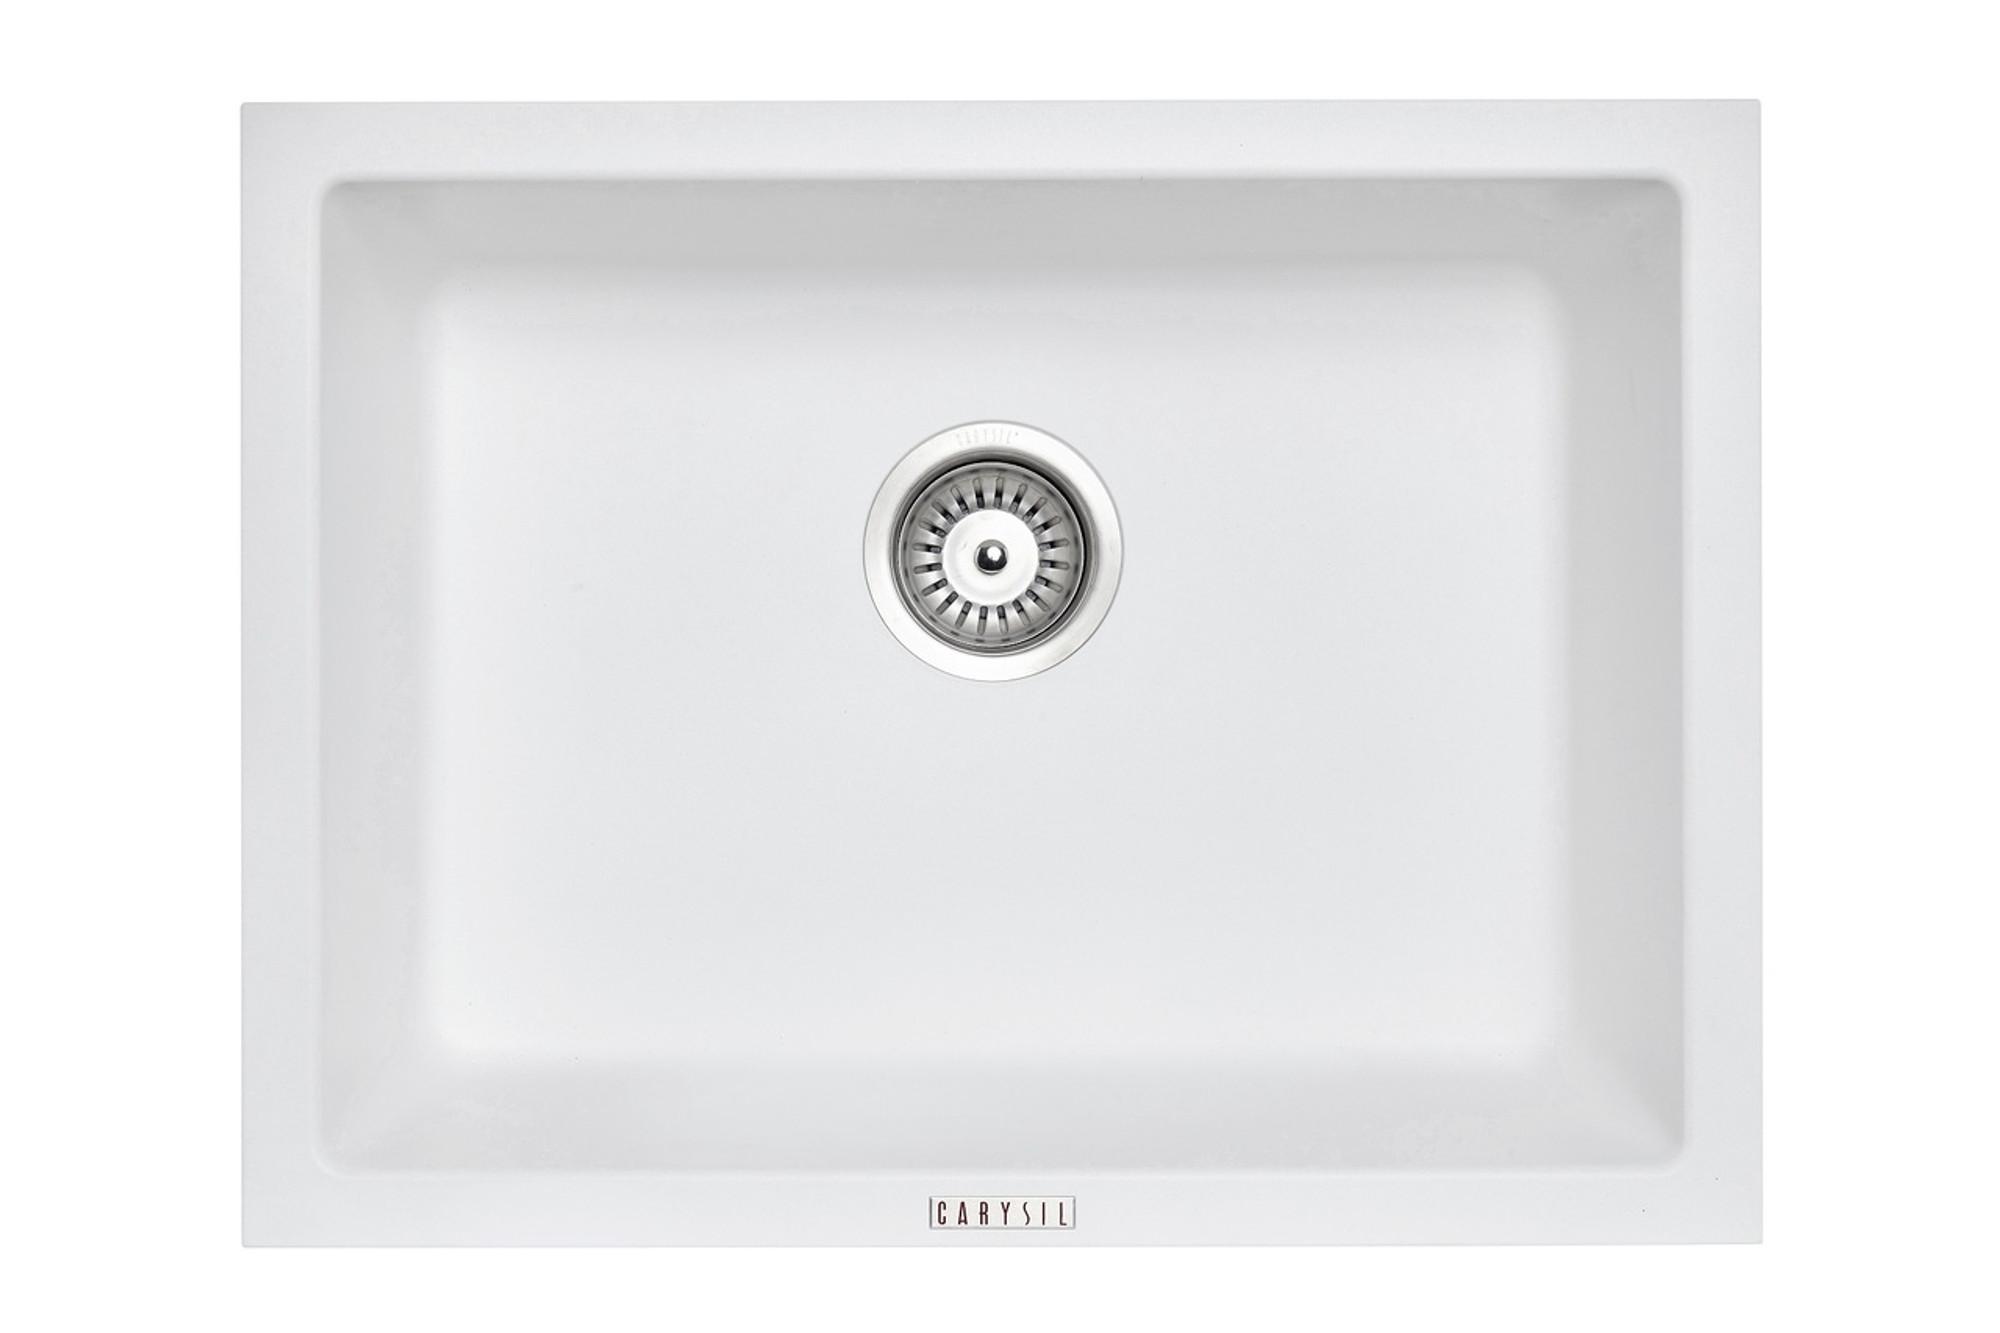 Carysil Granite Kitchen Sink Drop In Or Under Mount Single Bowl 610x457